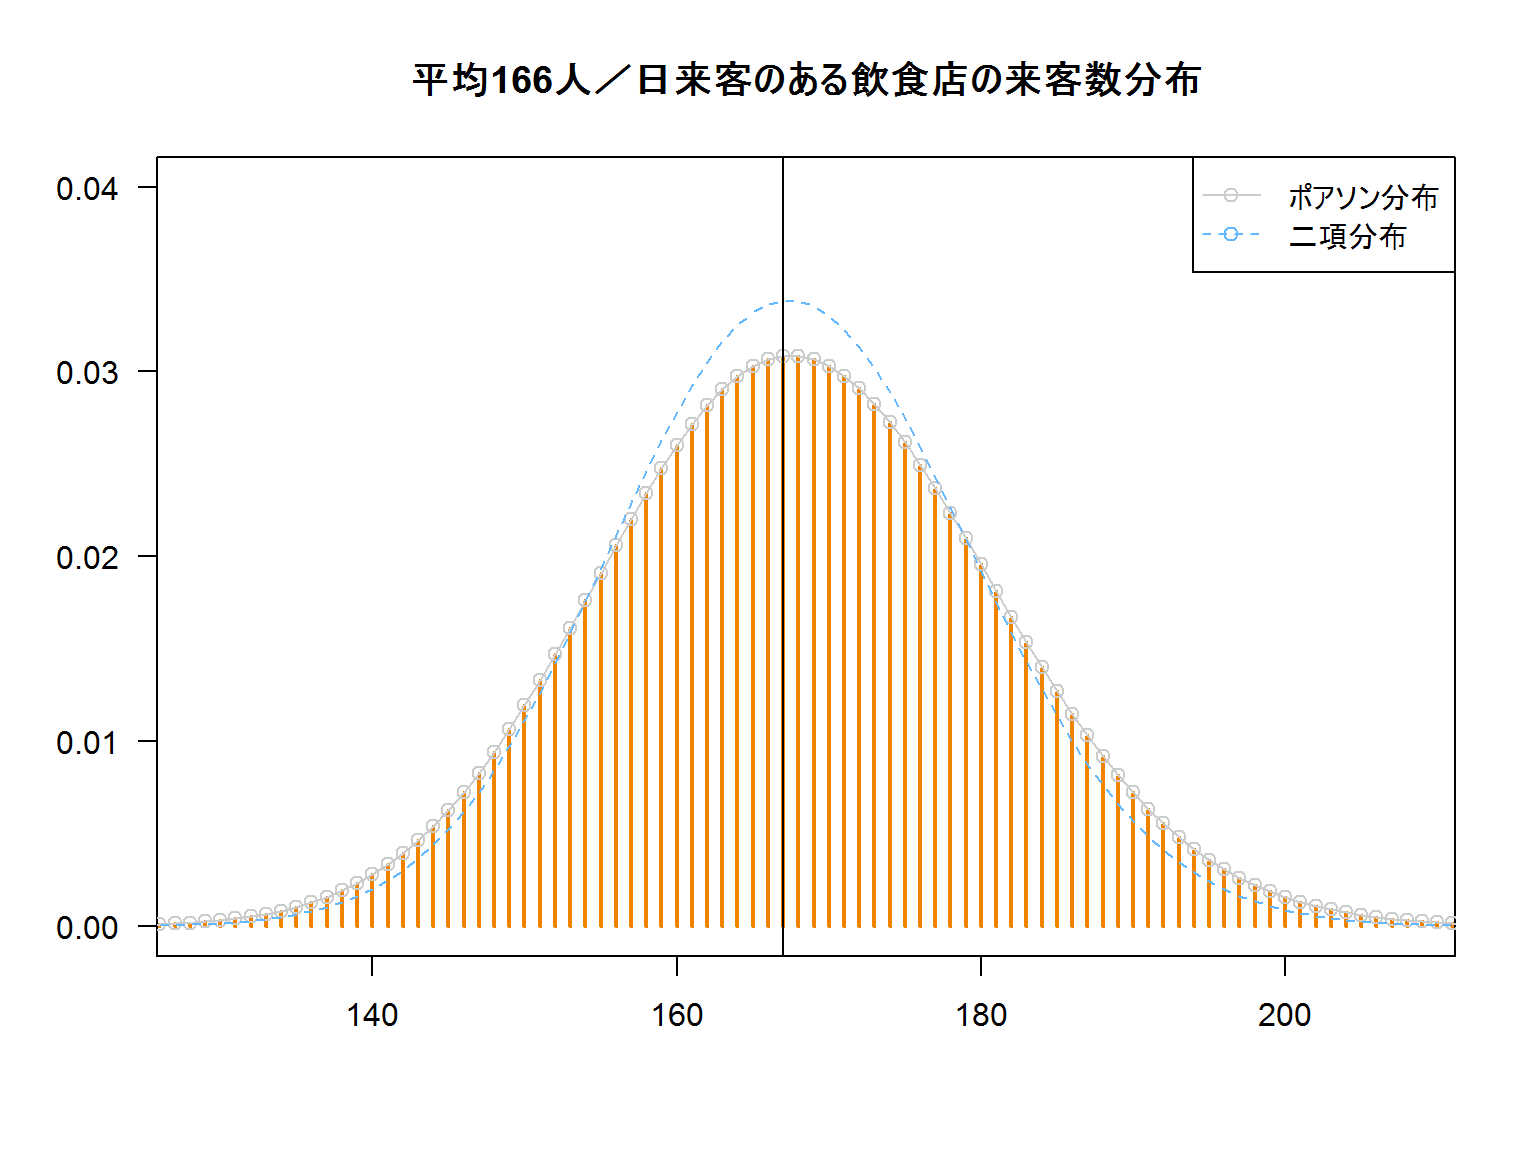 Poisson_distribution_2